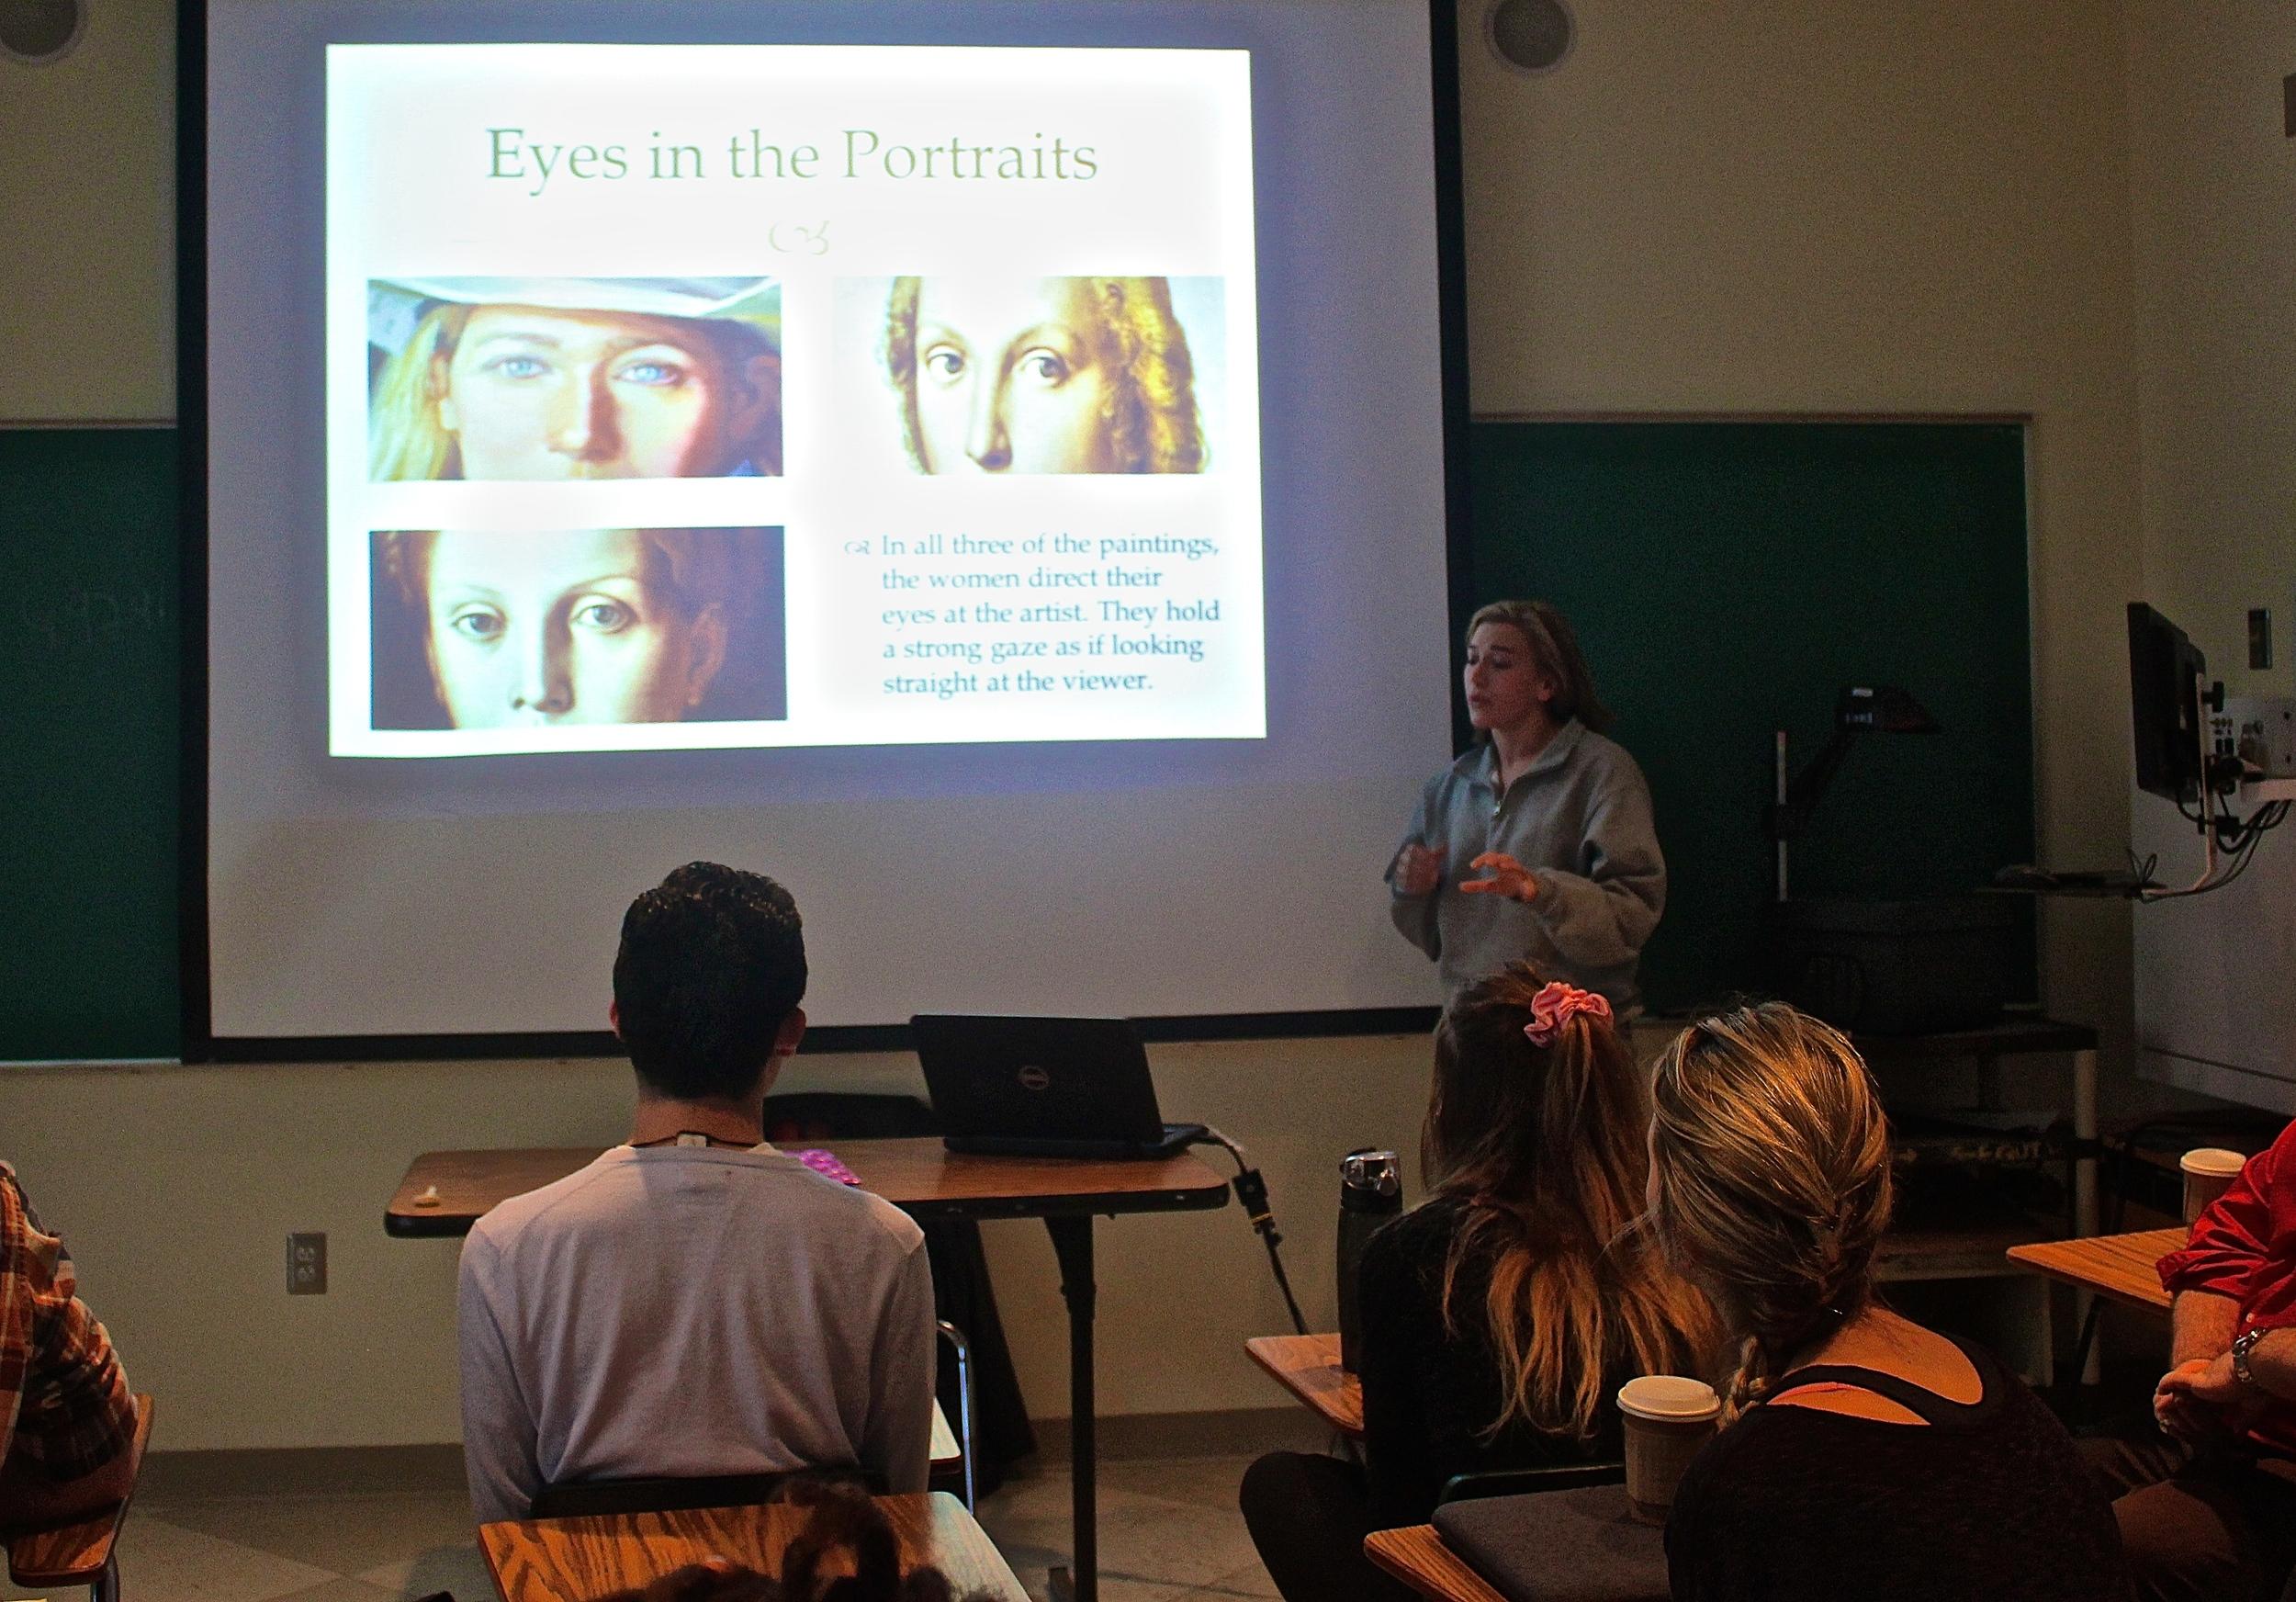 Madeleine Tucker reviews Elizabeth Poett's portrait, drawing comparisons to Raphael's Woman with Unicorn and Bronzino's Portrait of Lucrezia Panciatichi